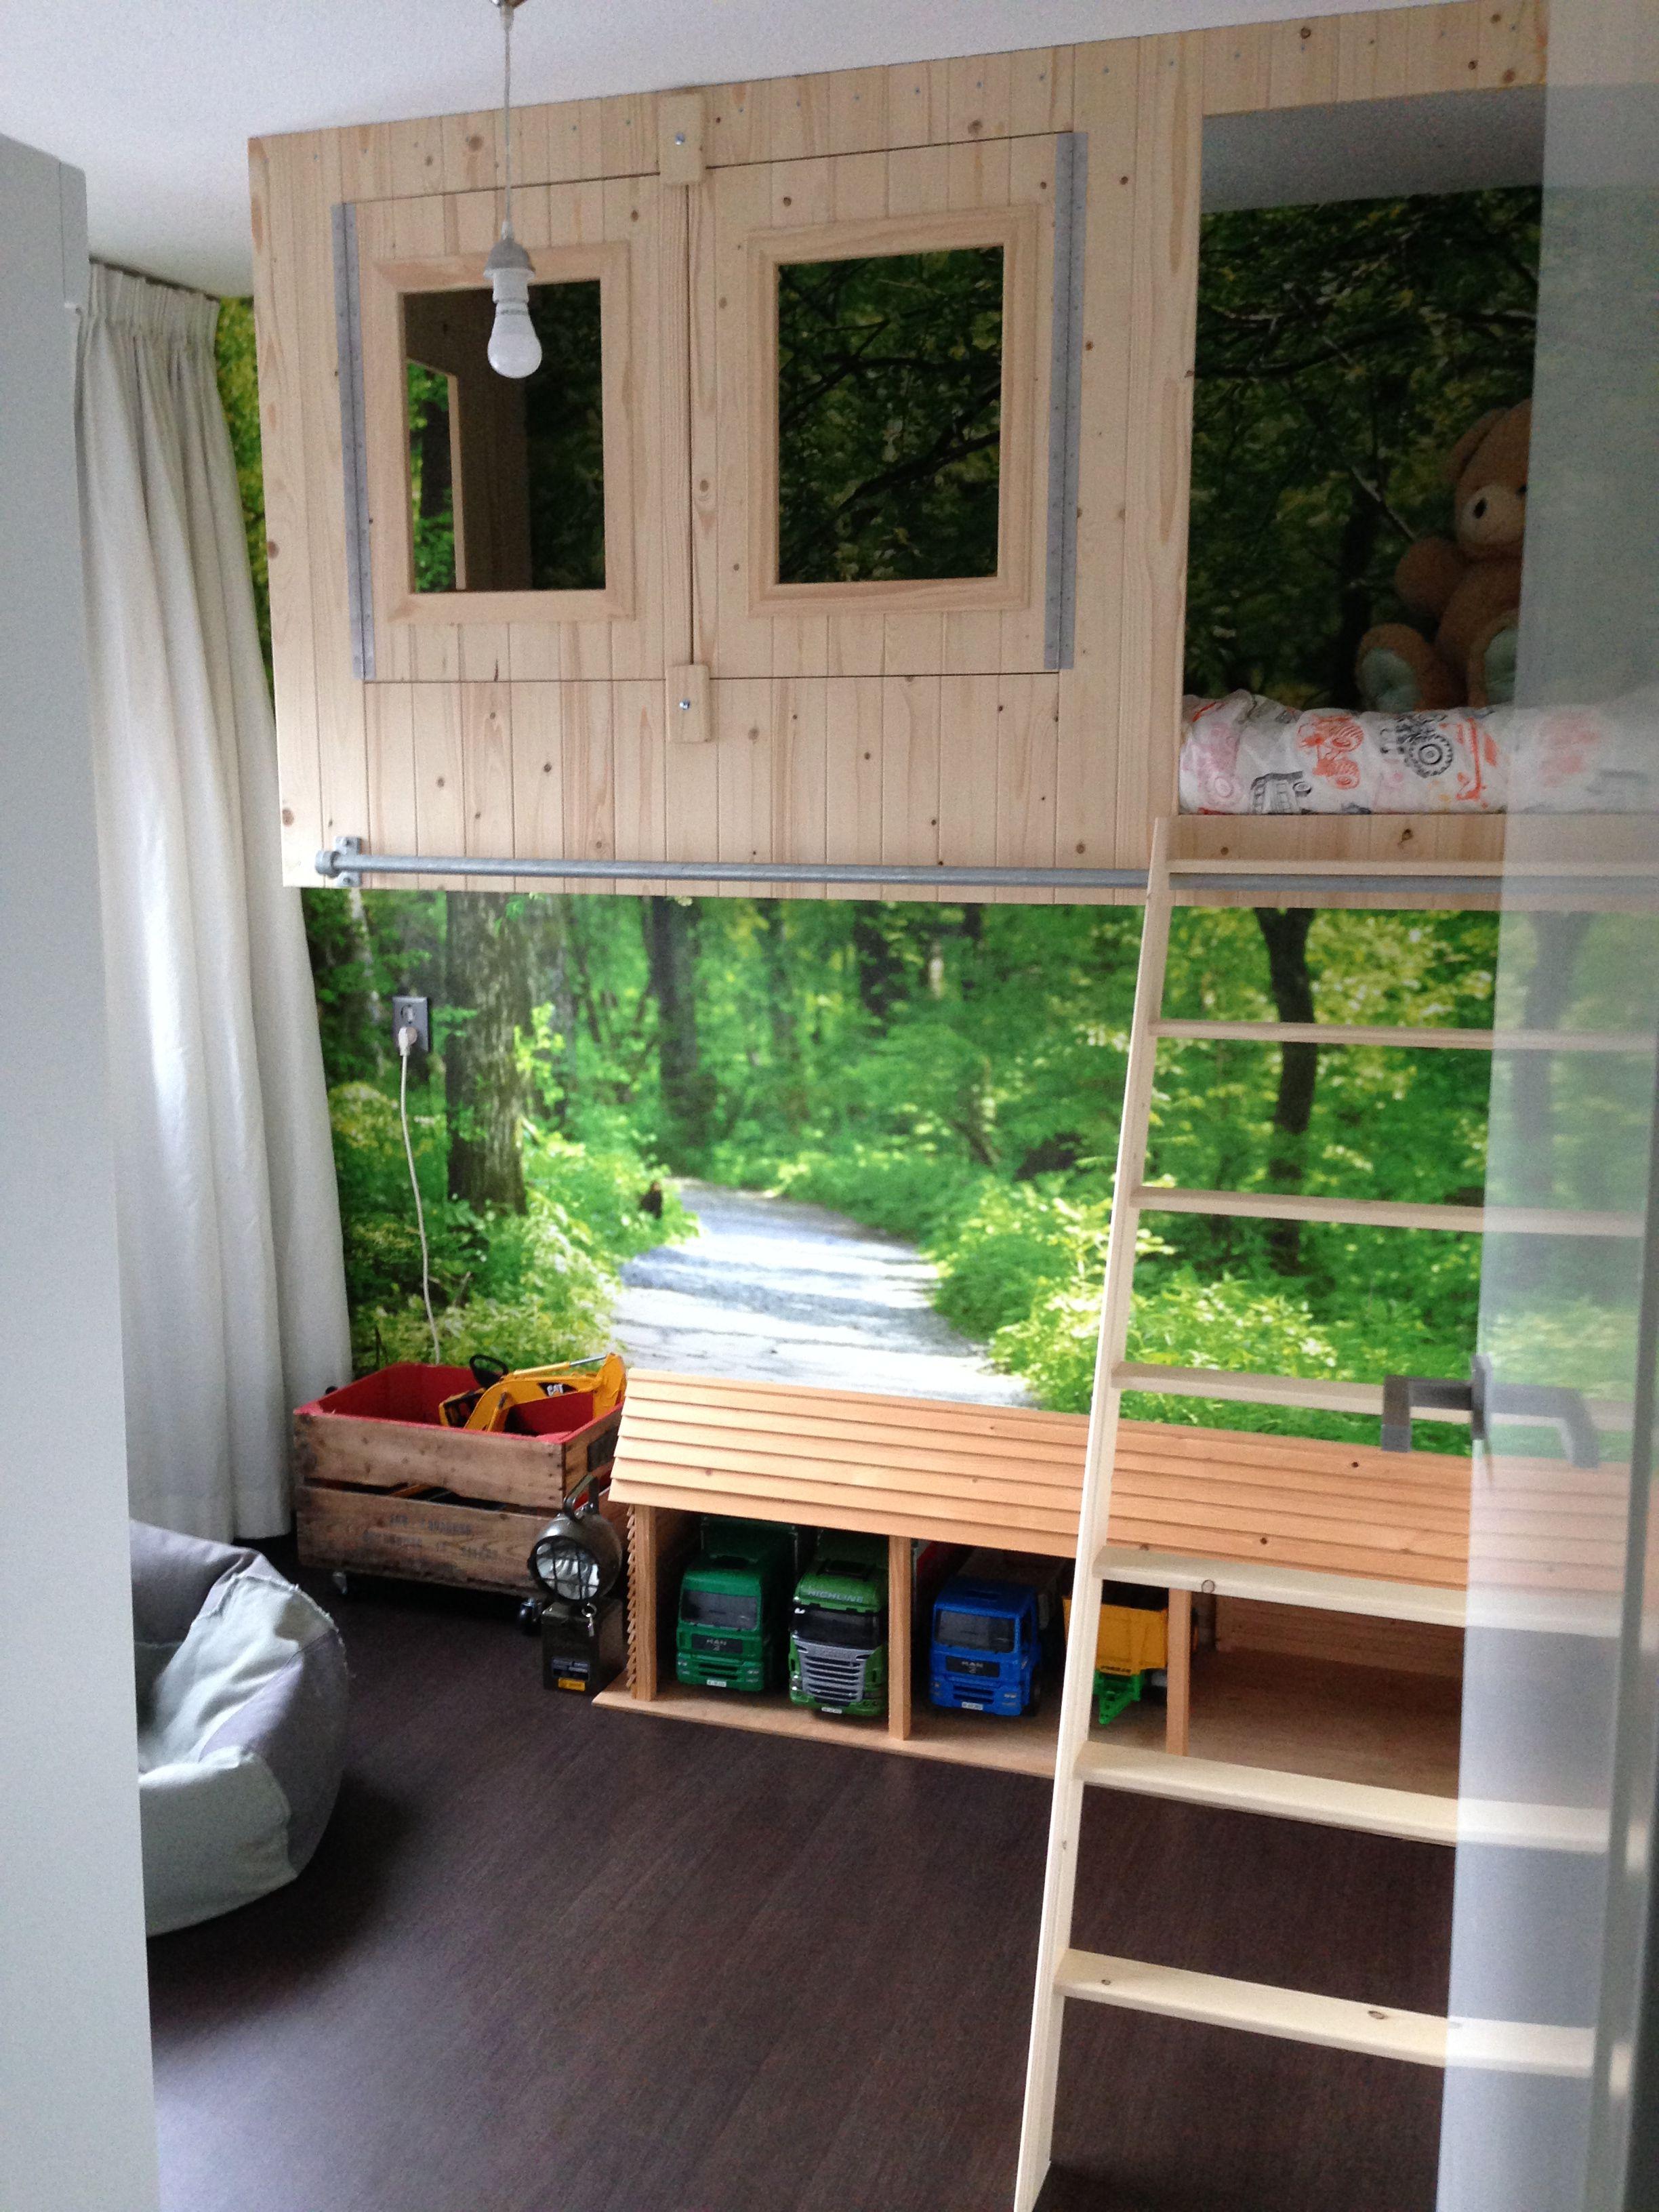 Jongens slaapkamer boomhut | Inrichting | Pinterest - Boomhut ...